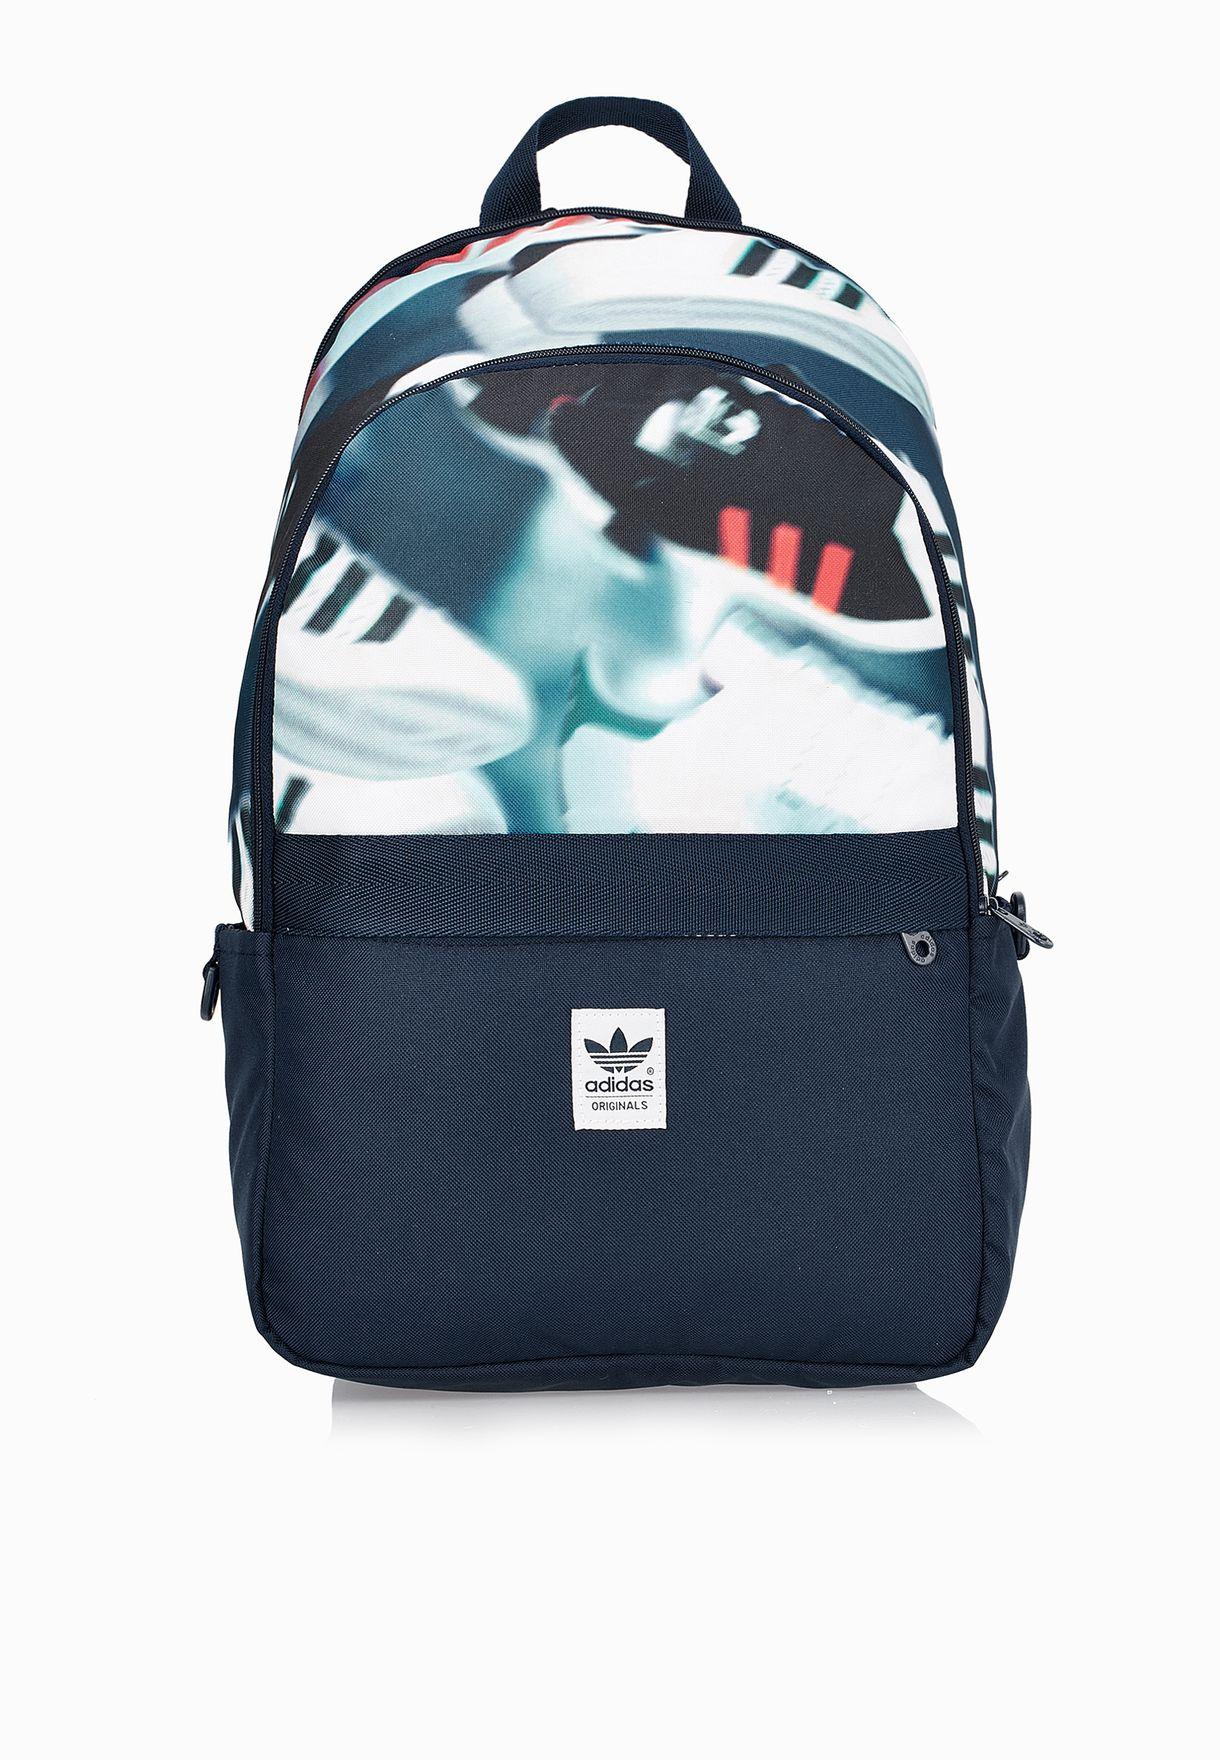 ef2c664132b Shop adidas Originals blue Shoe Chaos Backpack AX5789 for Men in ...